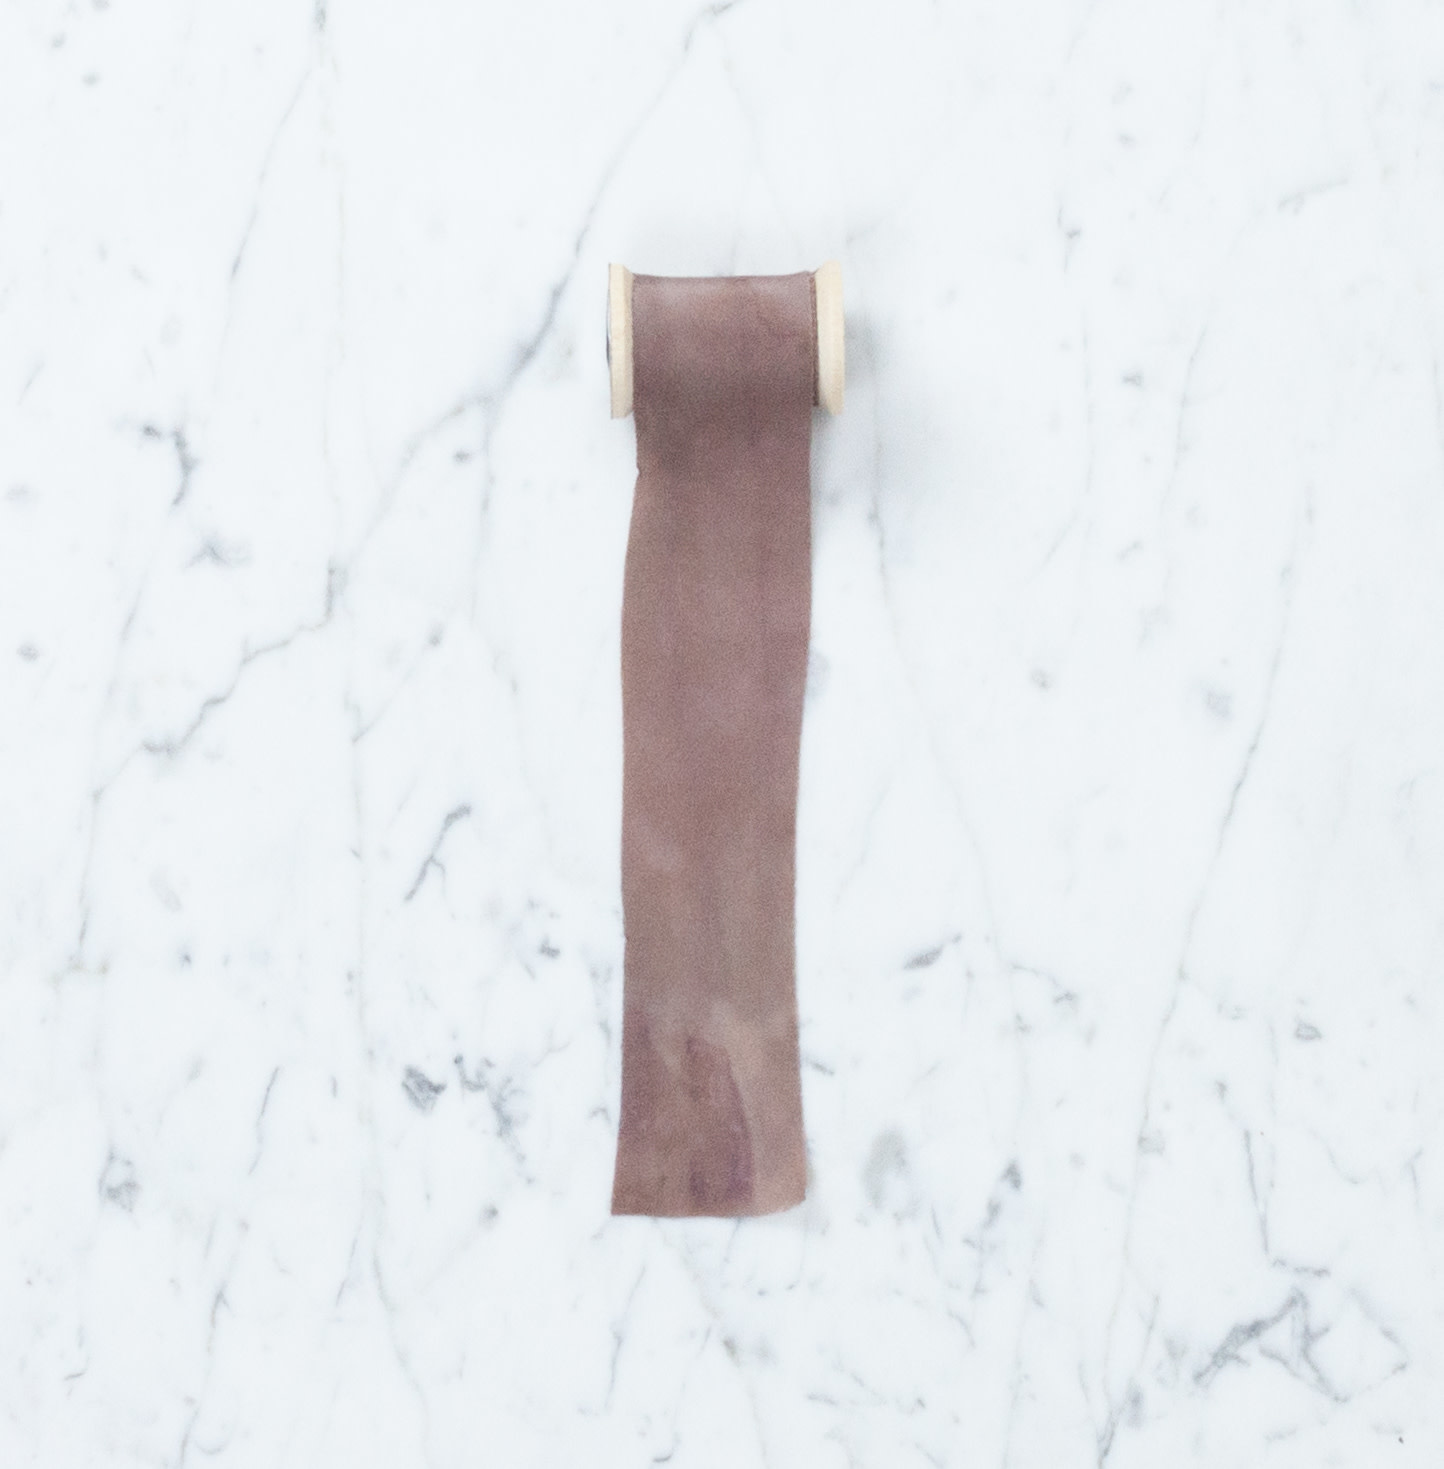 Northern Dyer Northern Dyer Natural Dye Silk Ribbon - Hibiscus - 6'